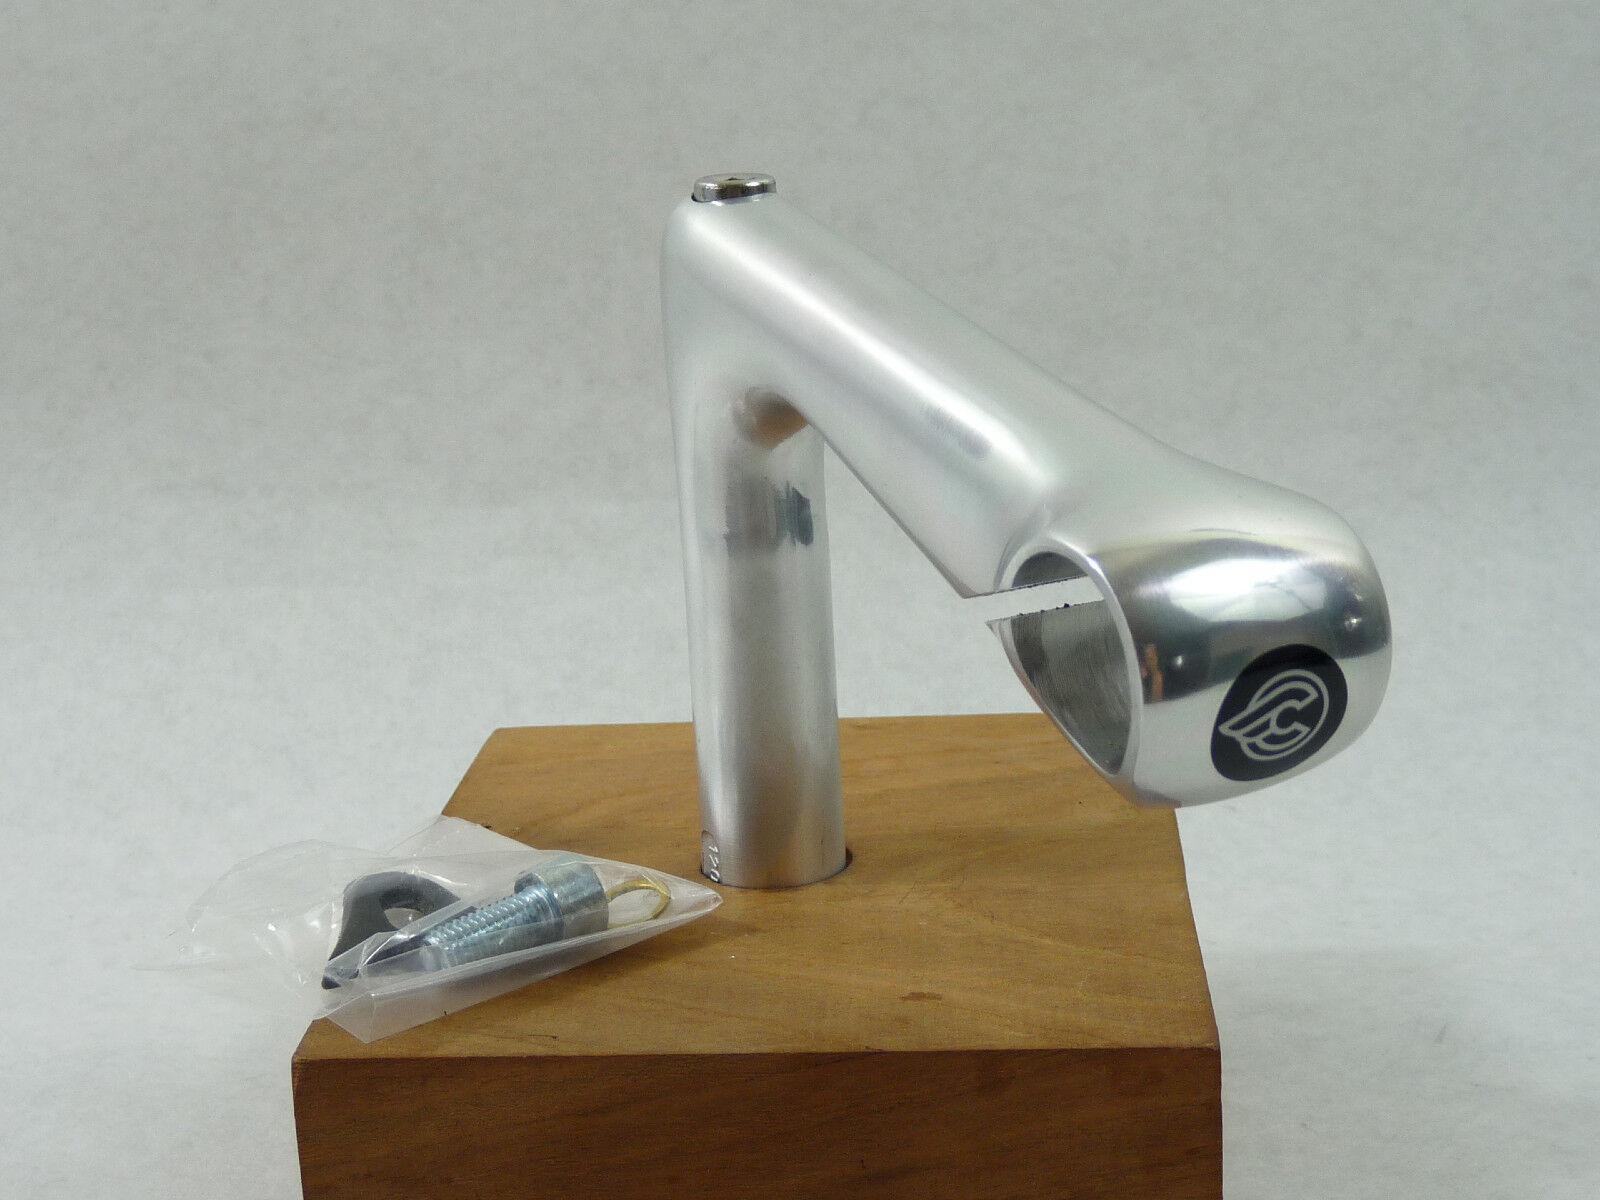 Cinelli tallo XE 120mm 22.2 Raro 26.0 Abrazadera Vintage carreras de carretera Bicicleta nuevo viejo Stock